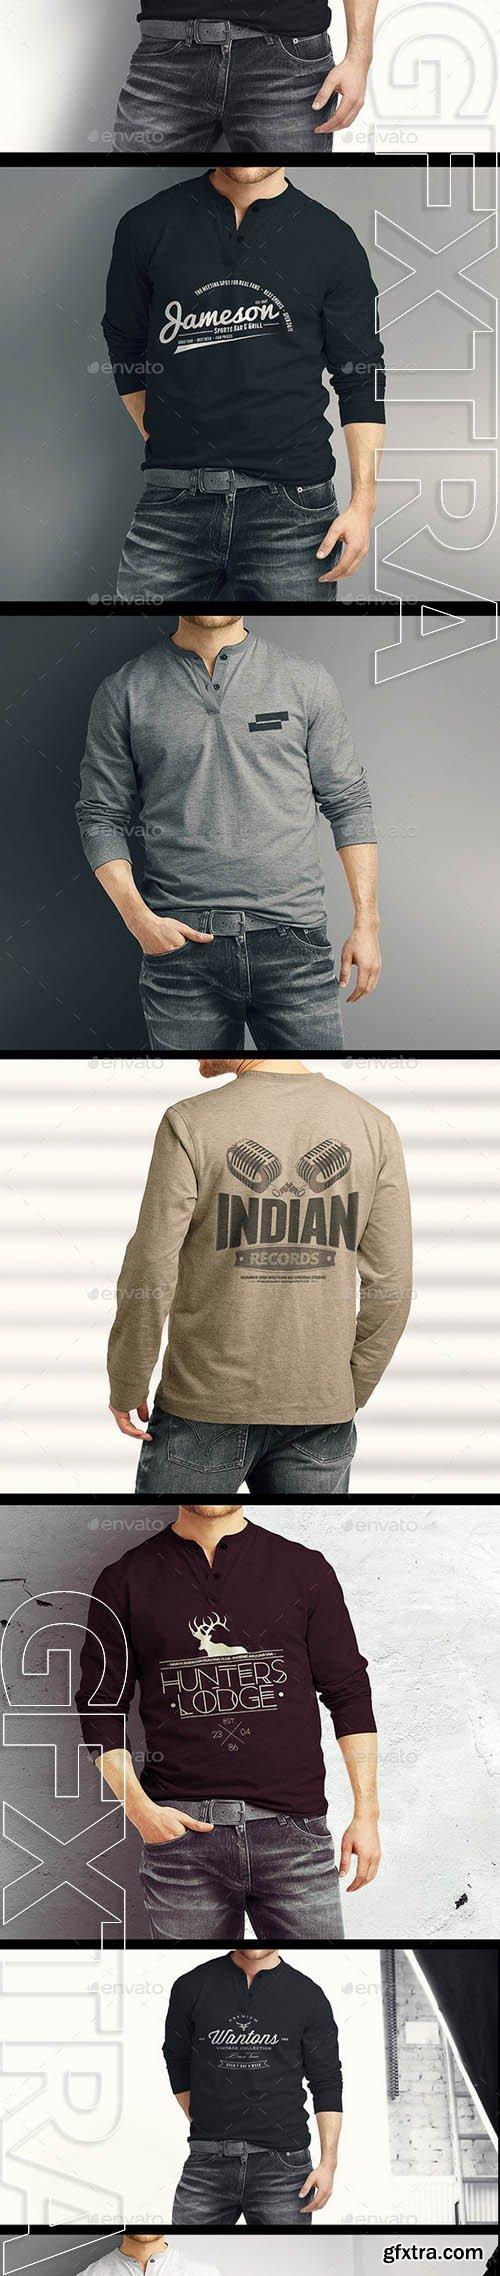 Graphicriver - Man Longsleeve Shirt Mock-up 9610861